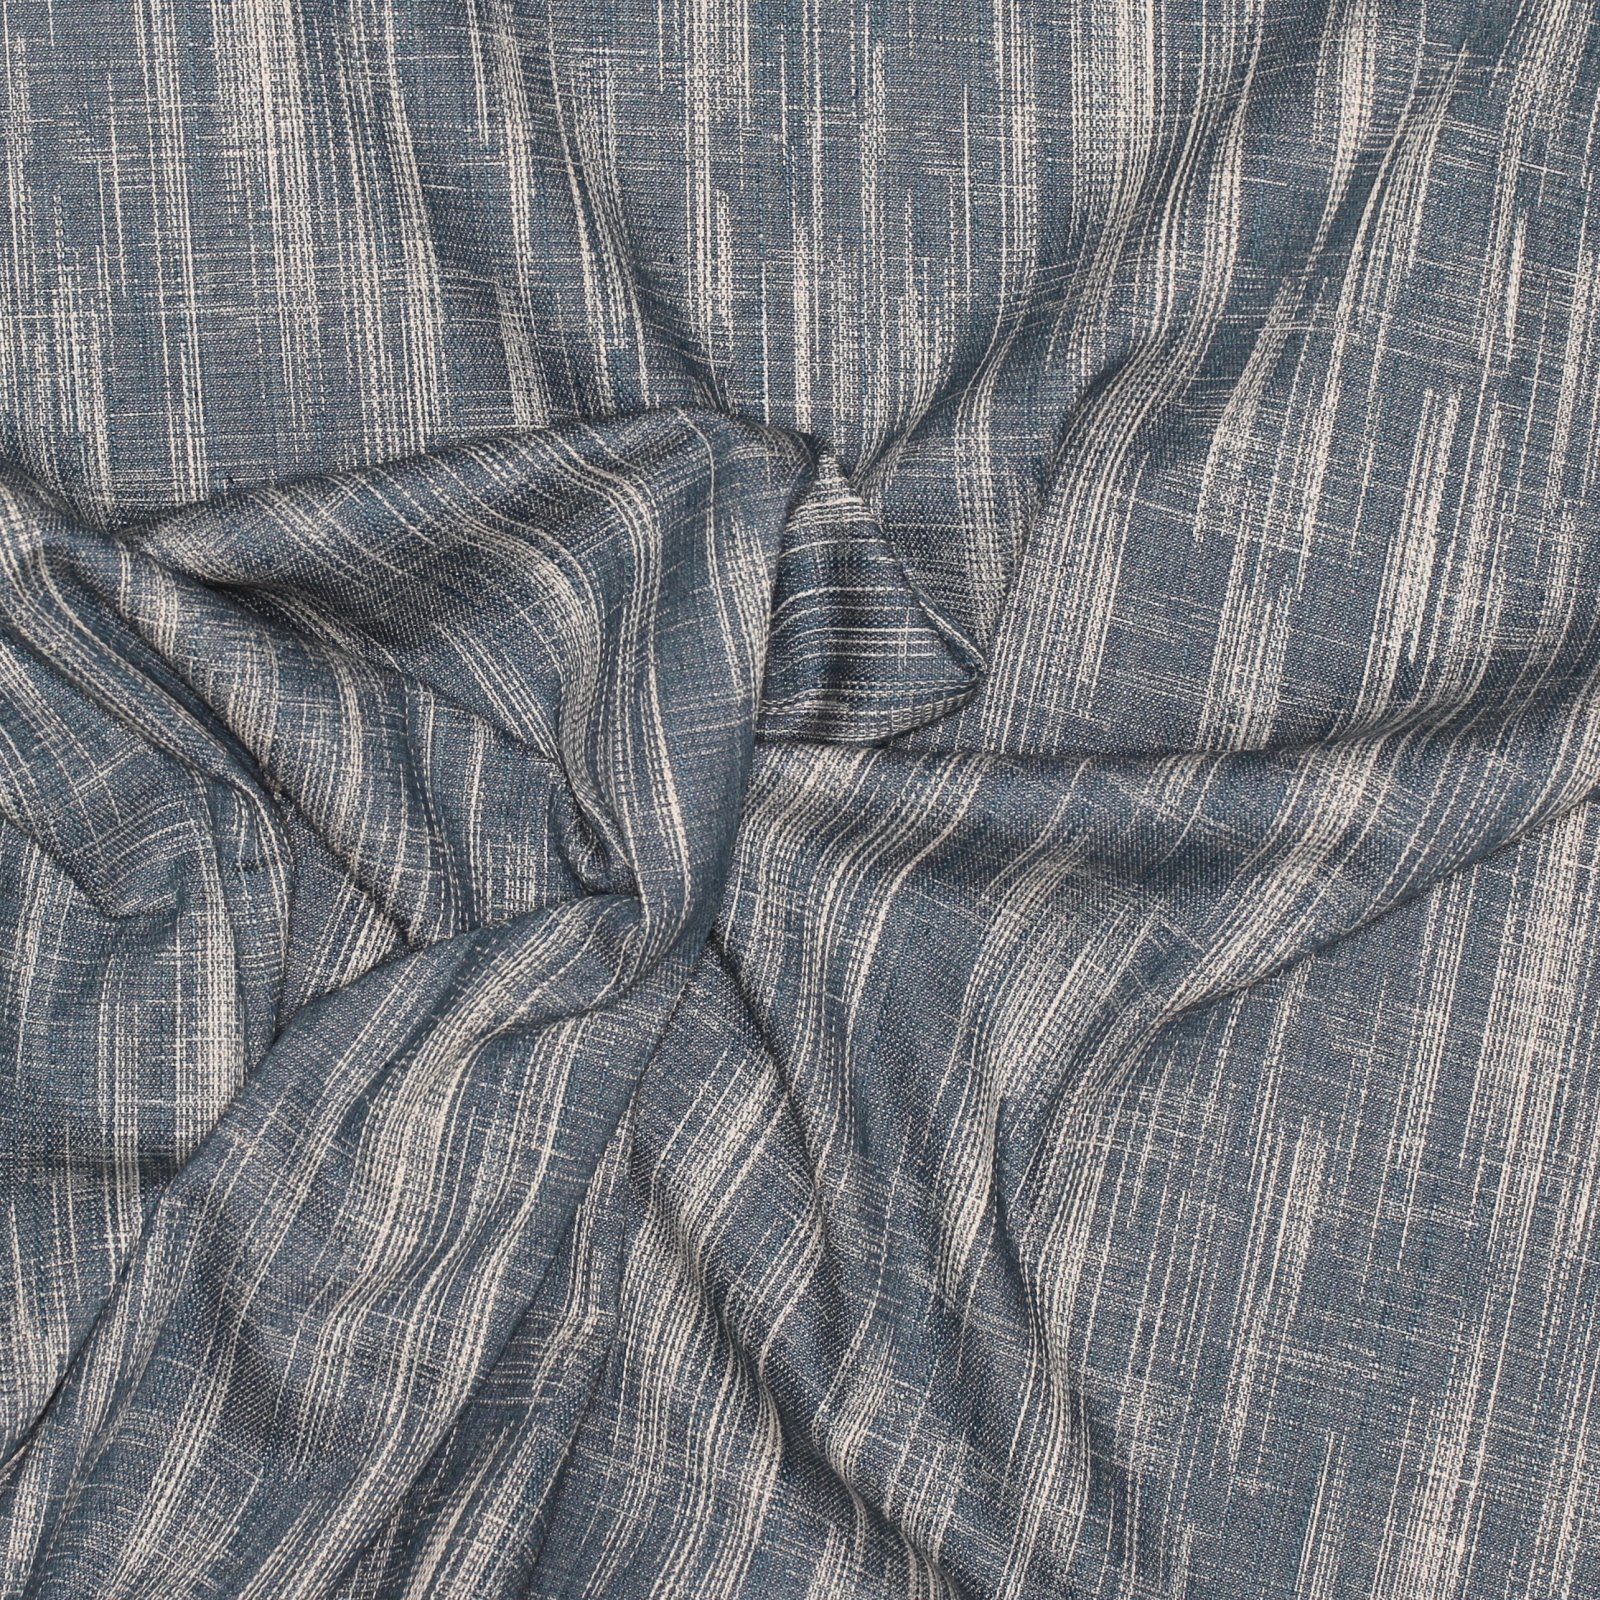 Textured Crosshatch Denim - Babbling Brook - Art Gallery